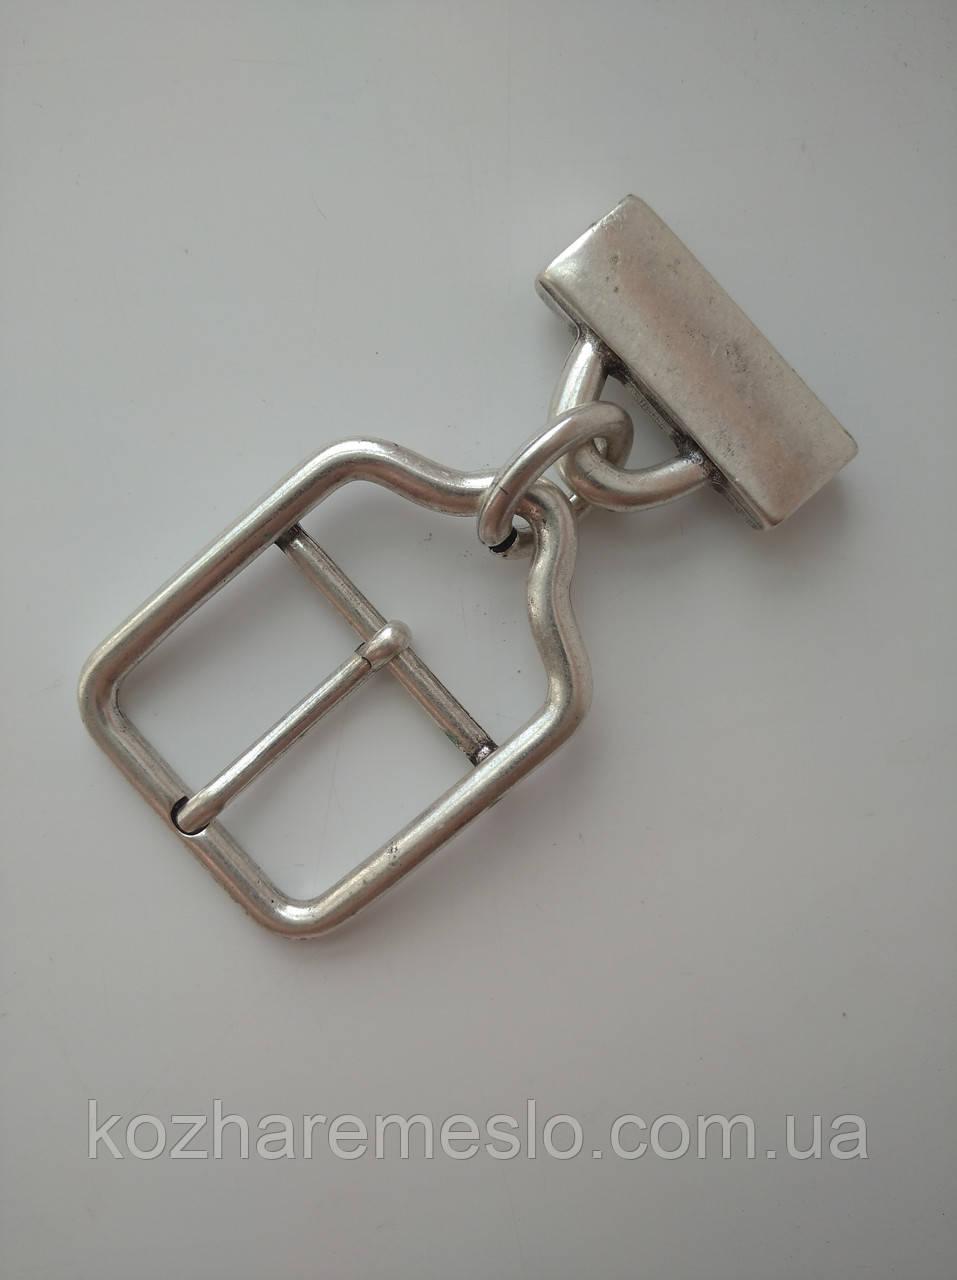 Пряжка лита для ременя 40 мм старе срібло